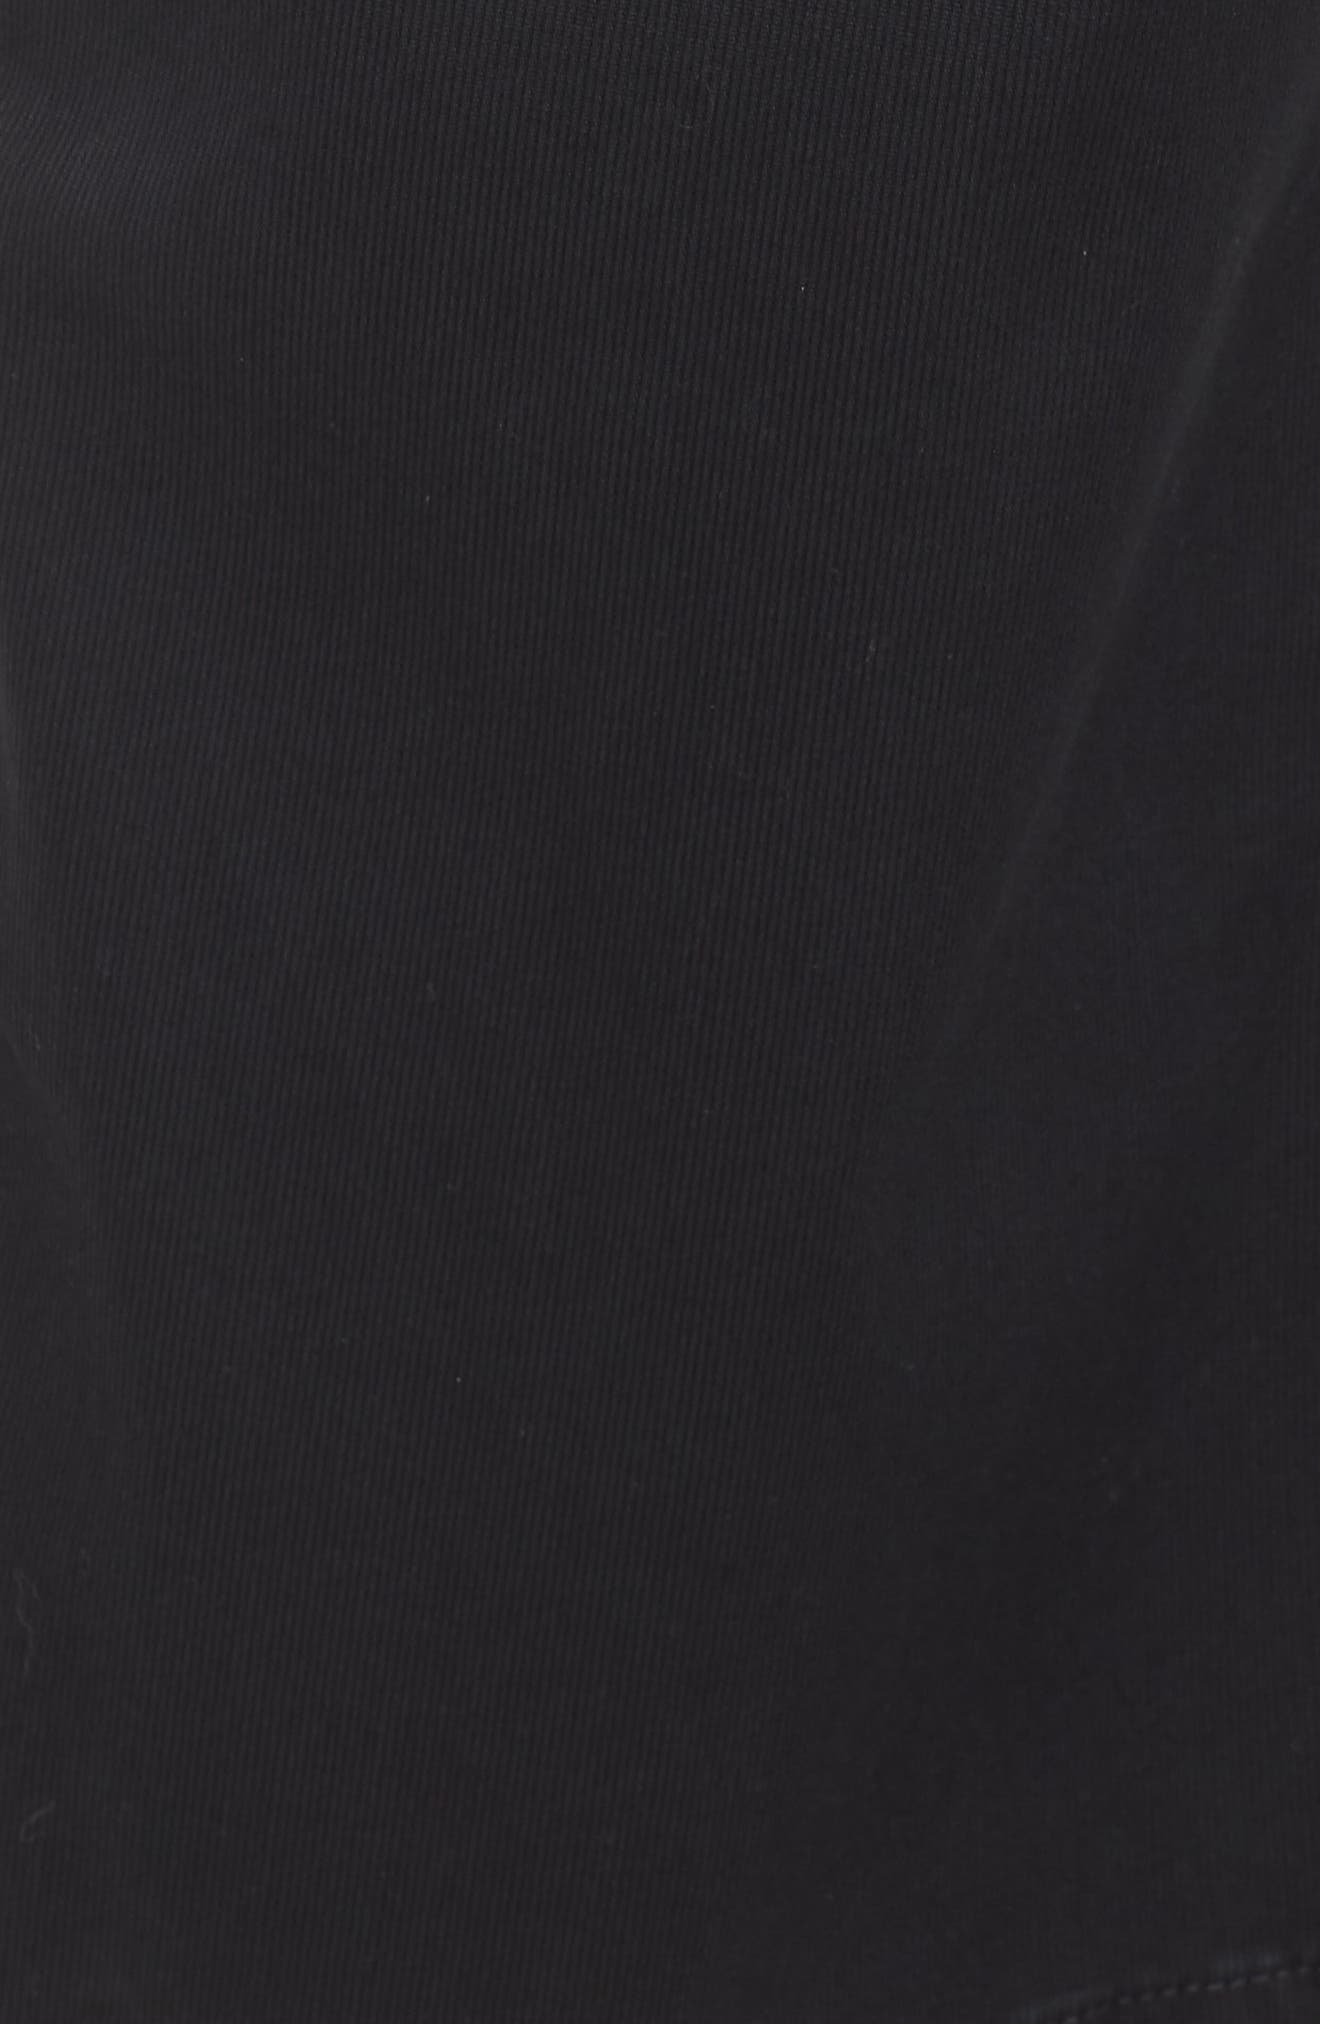 Etta High Waist Crop Wide Leg Jeans,                             Alternate thumbnail 6, color,                             SULFUR SUPER BLACK